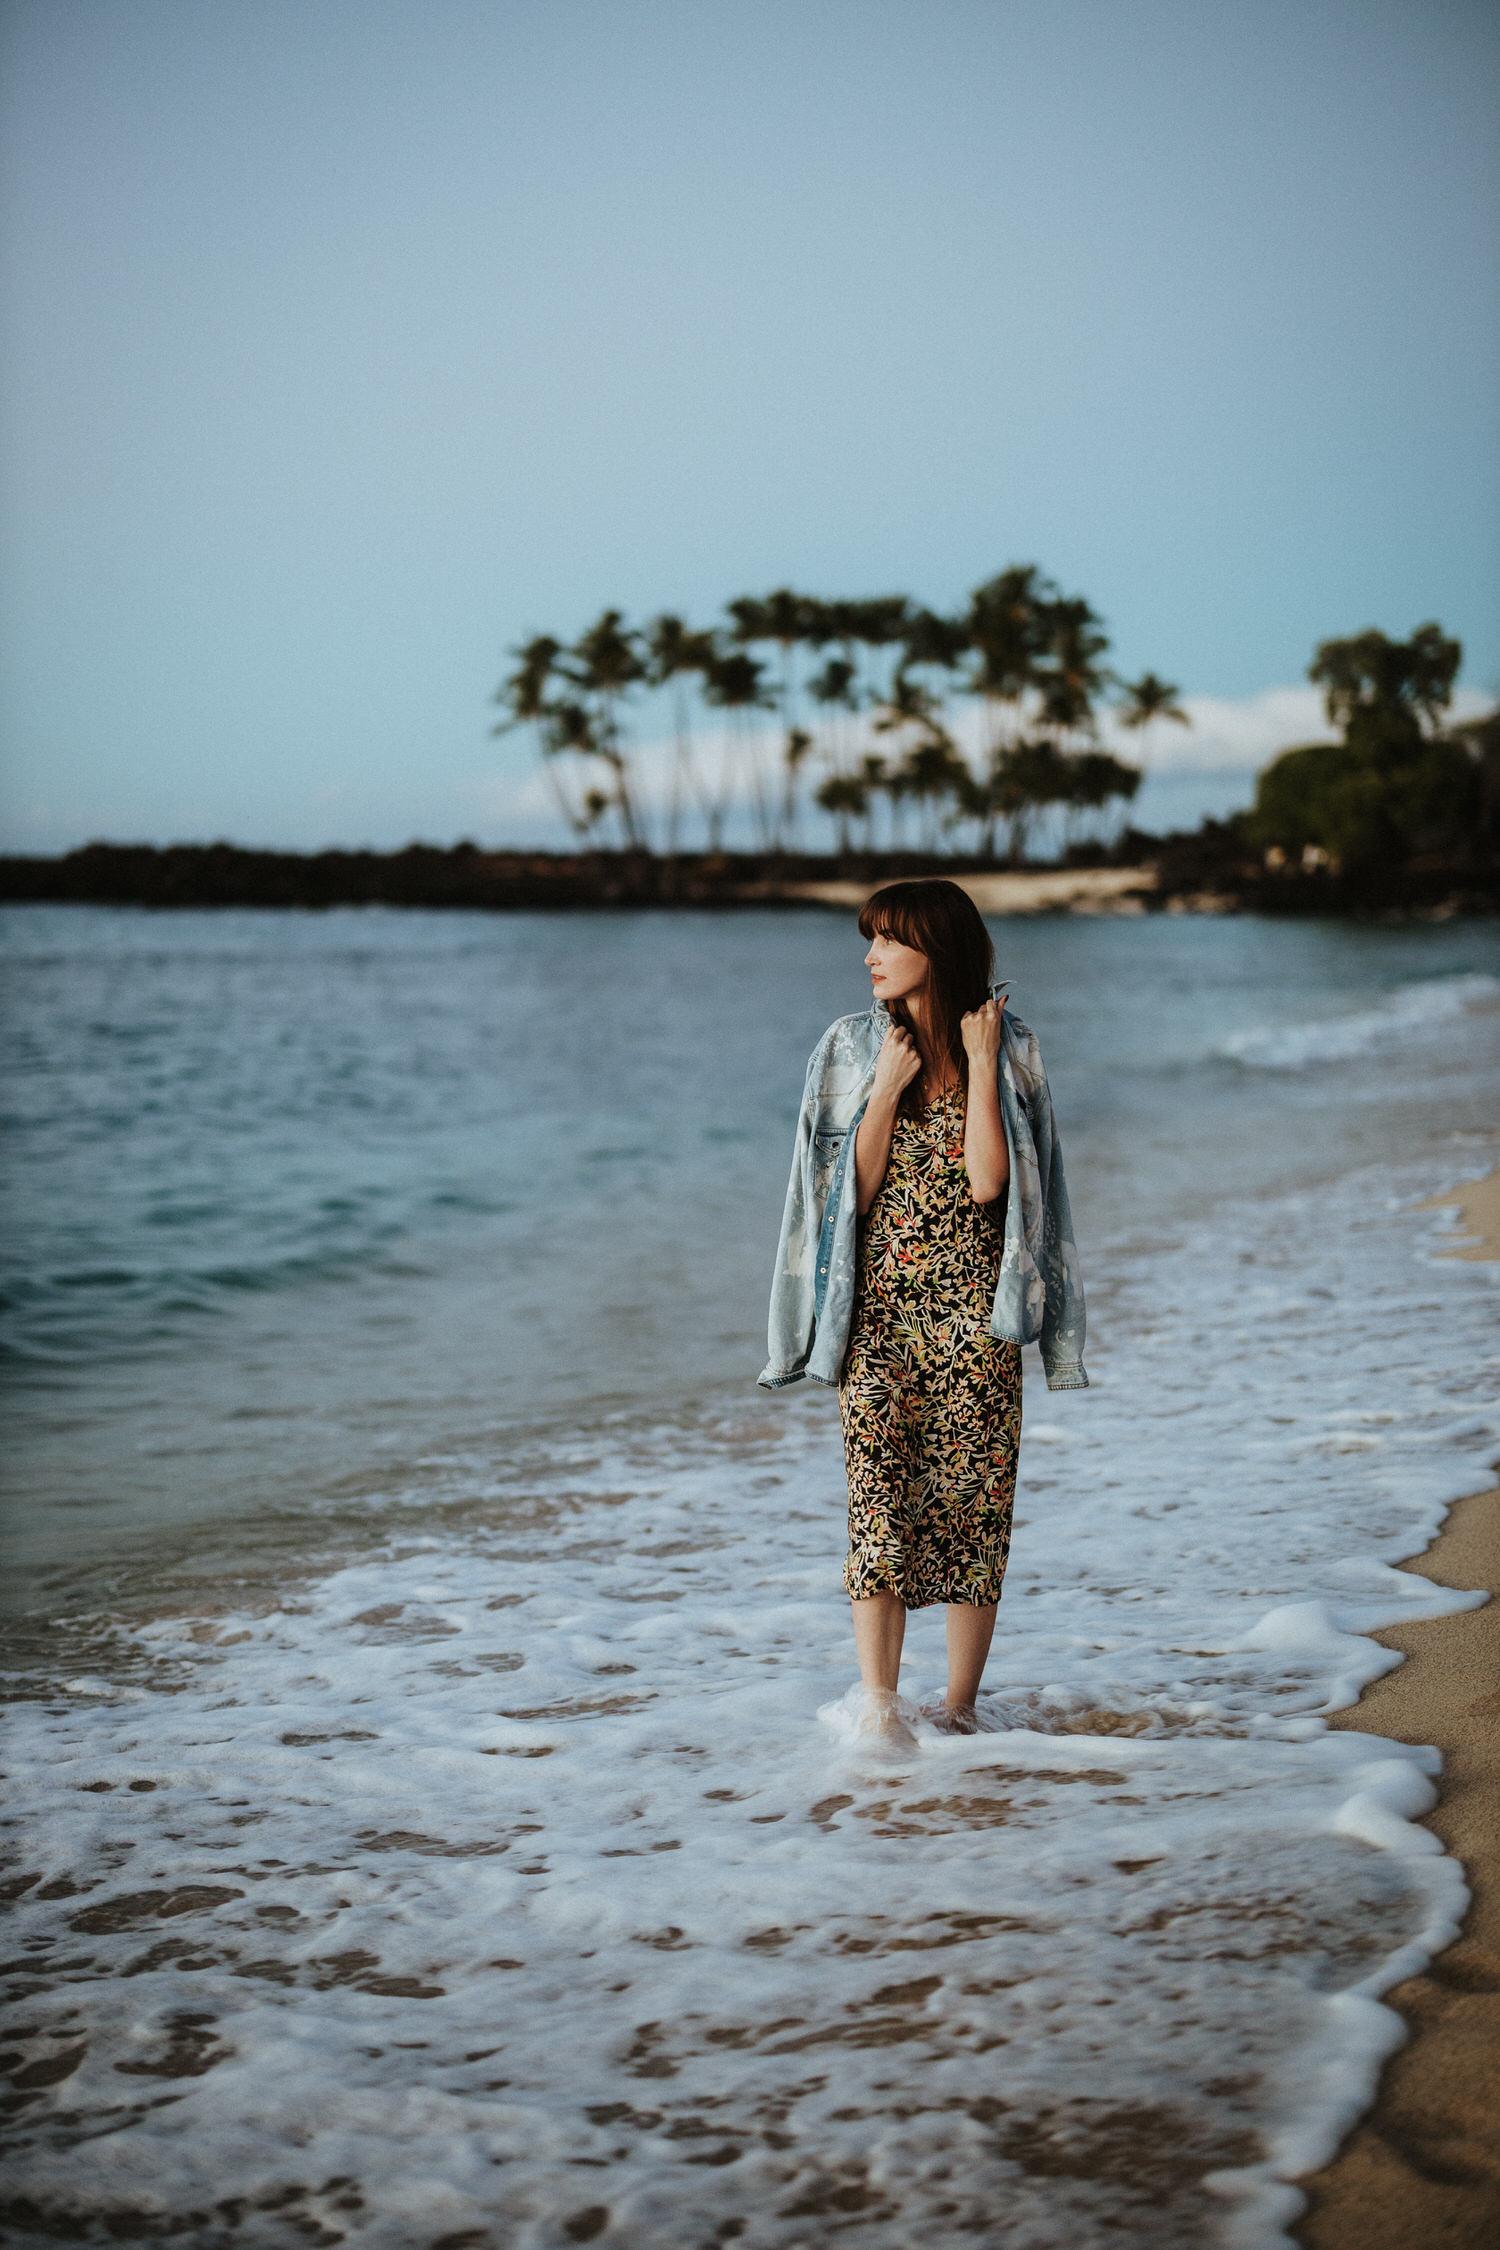 hawaii engagement, big island engagement, big island engagedment photographer, hawaii secret proposal, big island secret proposal, big island photographer, kona photographer, kona engagement, big island photo session, big island beaches, kekaha state park, Mahai'ulu Bay, hawaii photo session